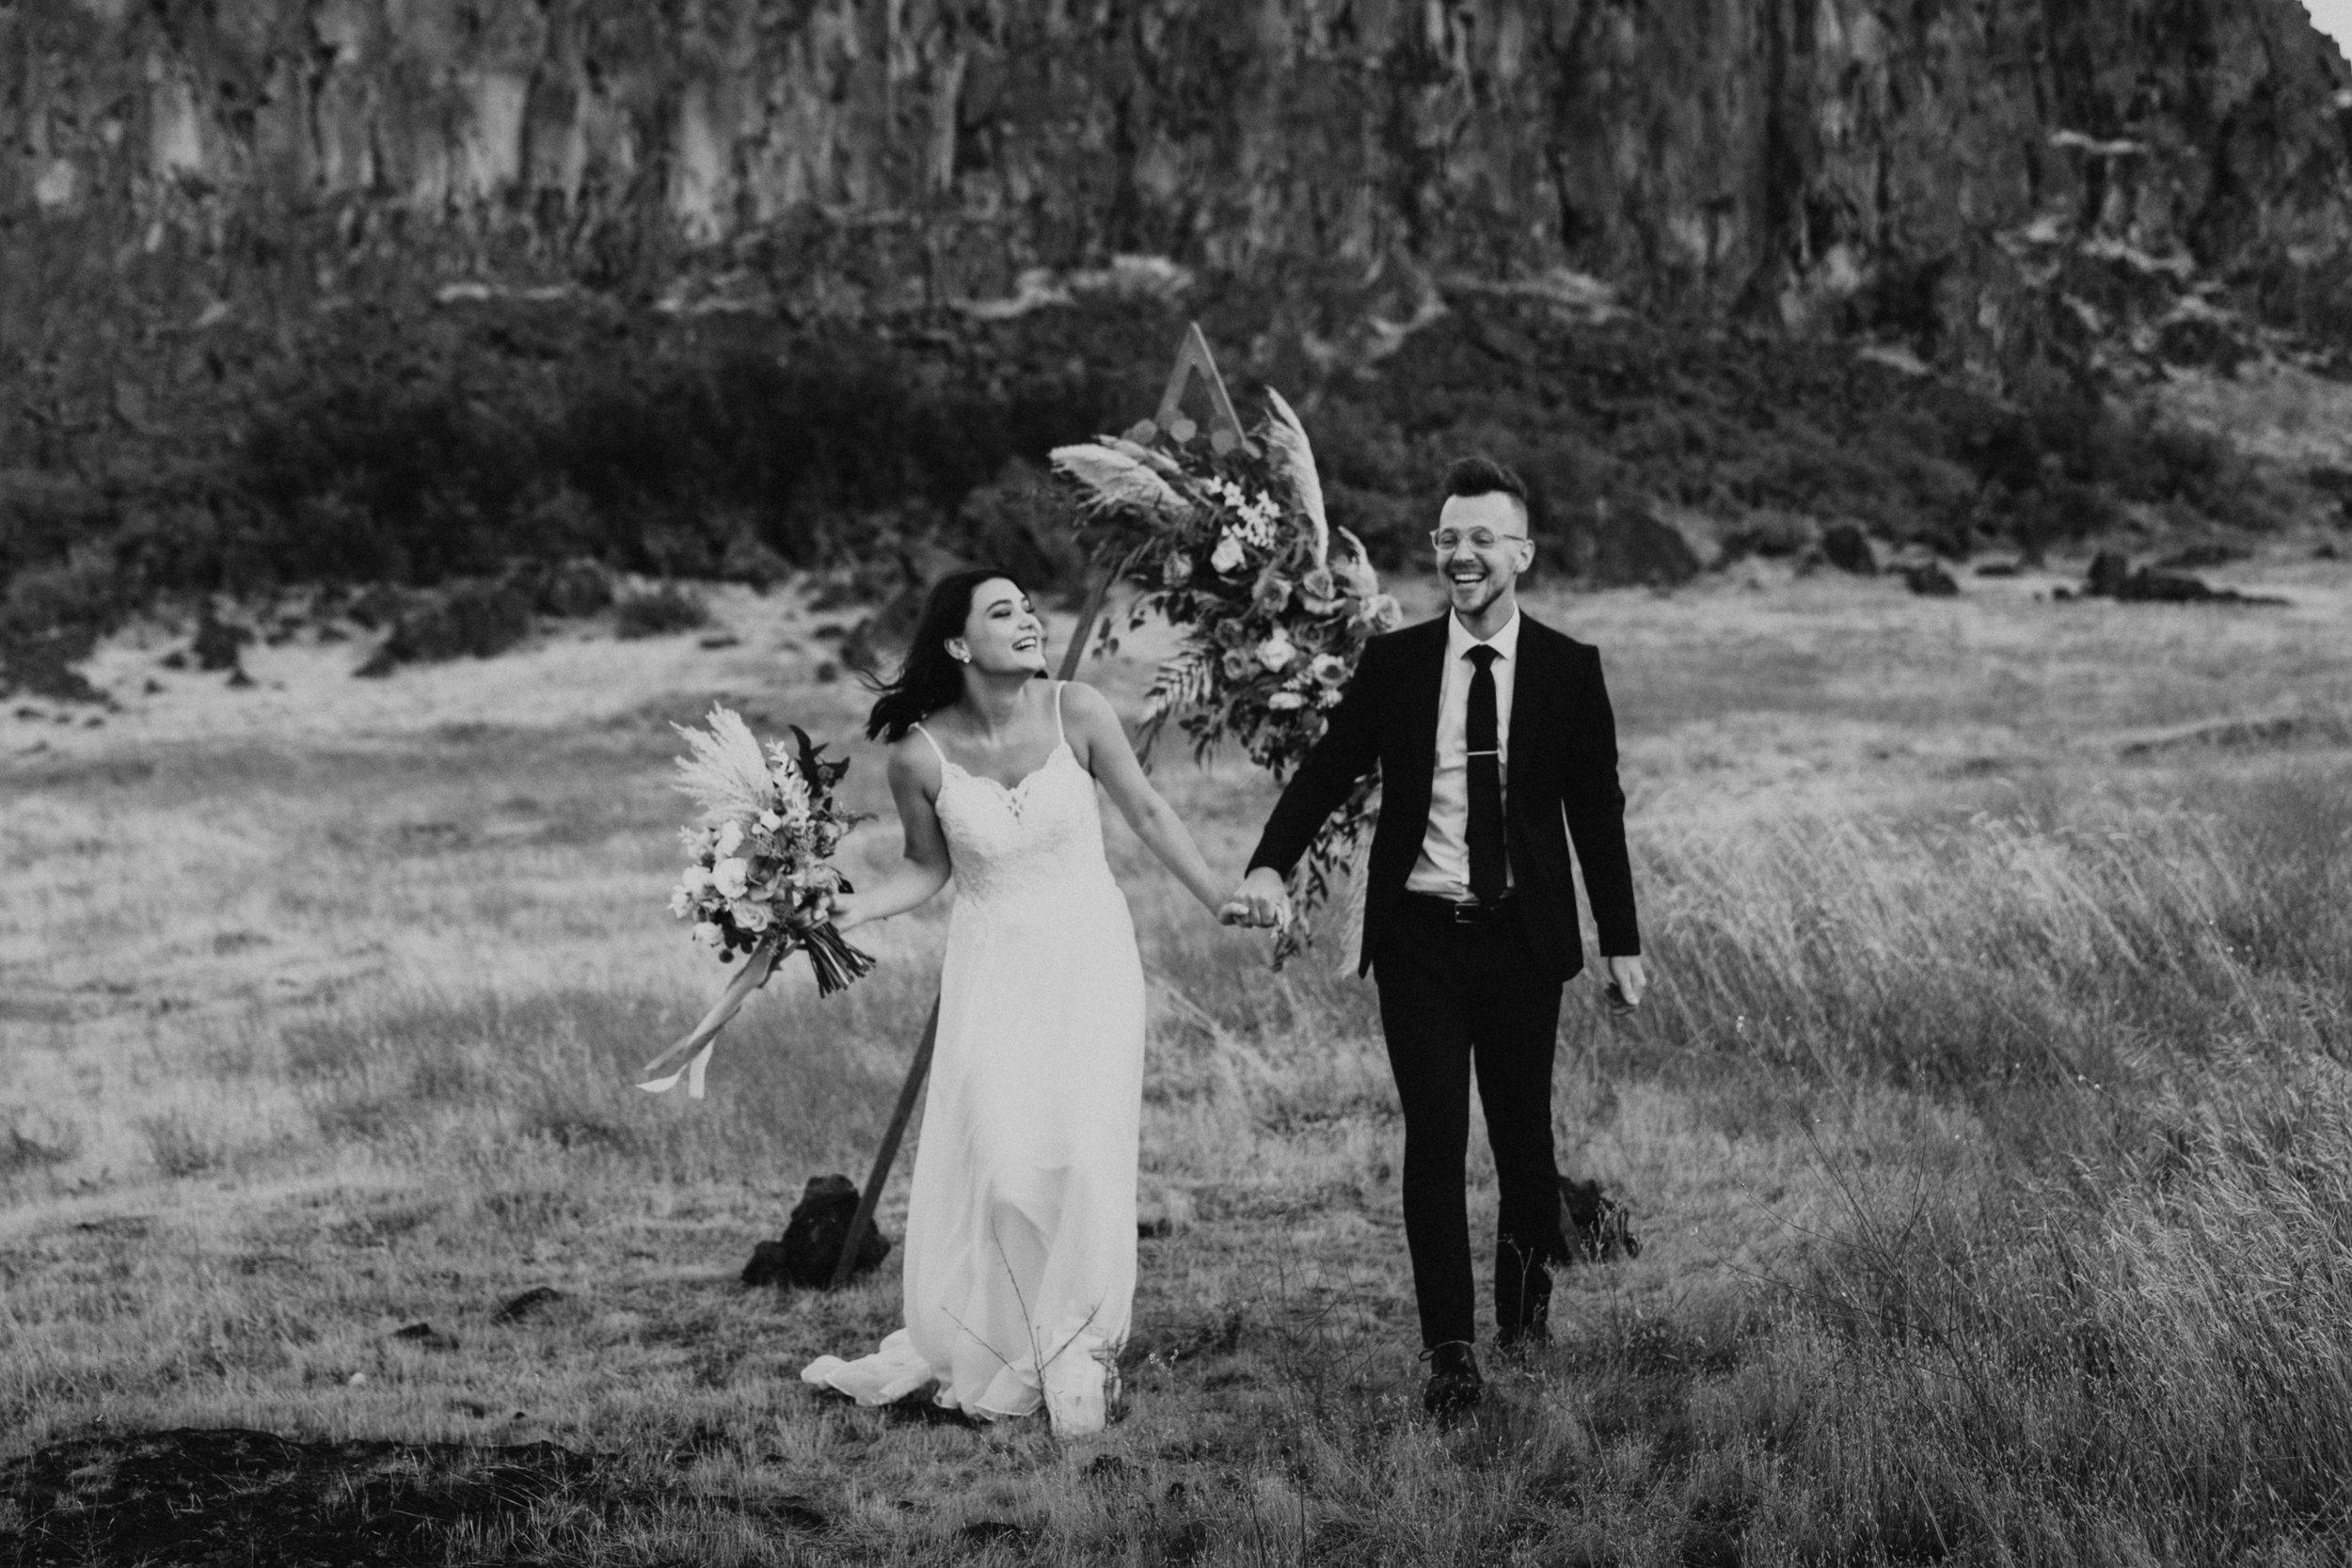 columbia-river-gorge-wedding-elopement-inspiration-24.jpg